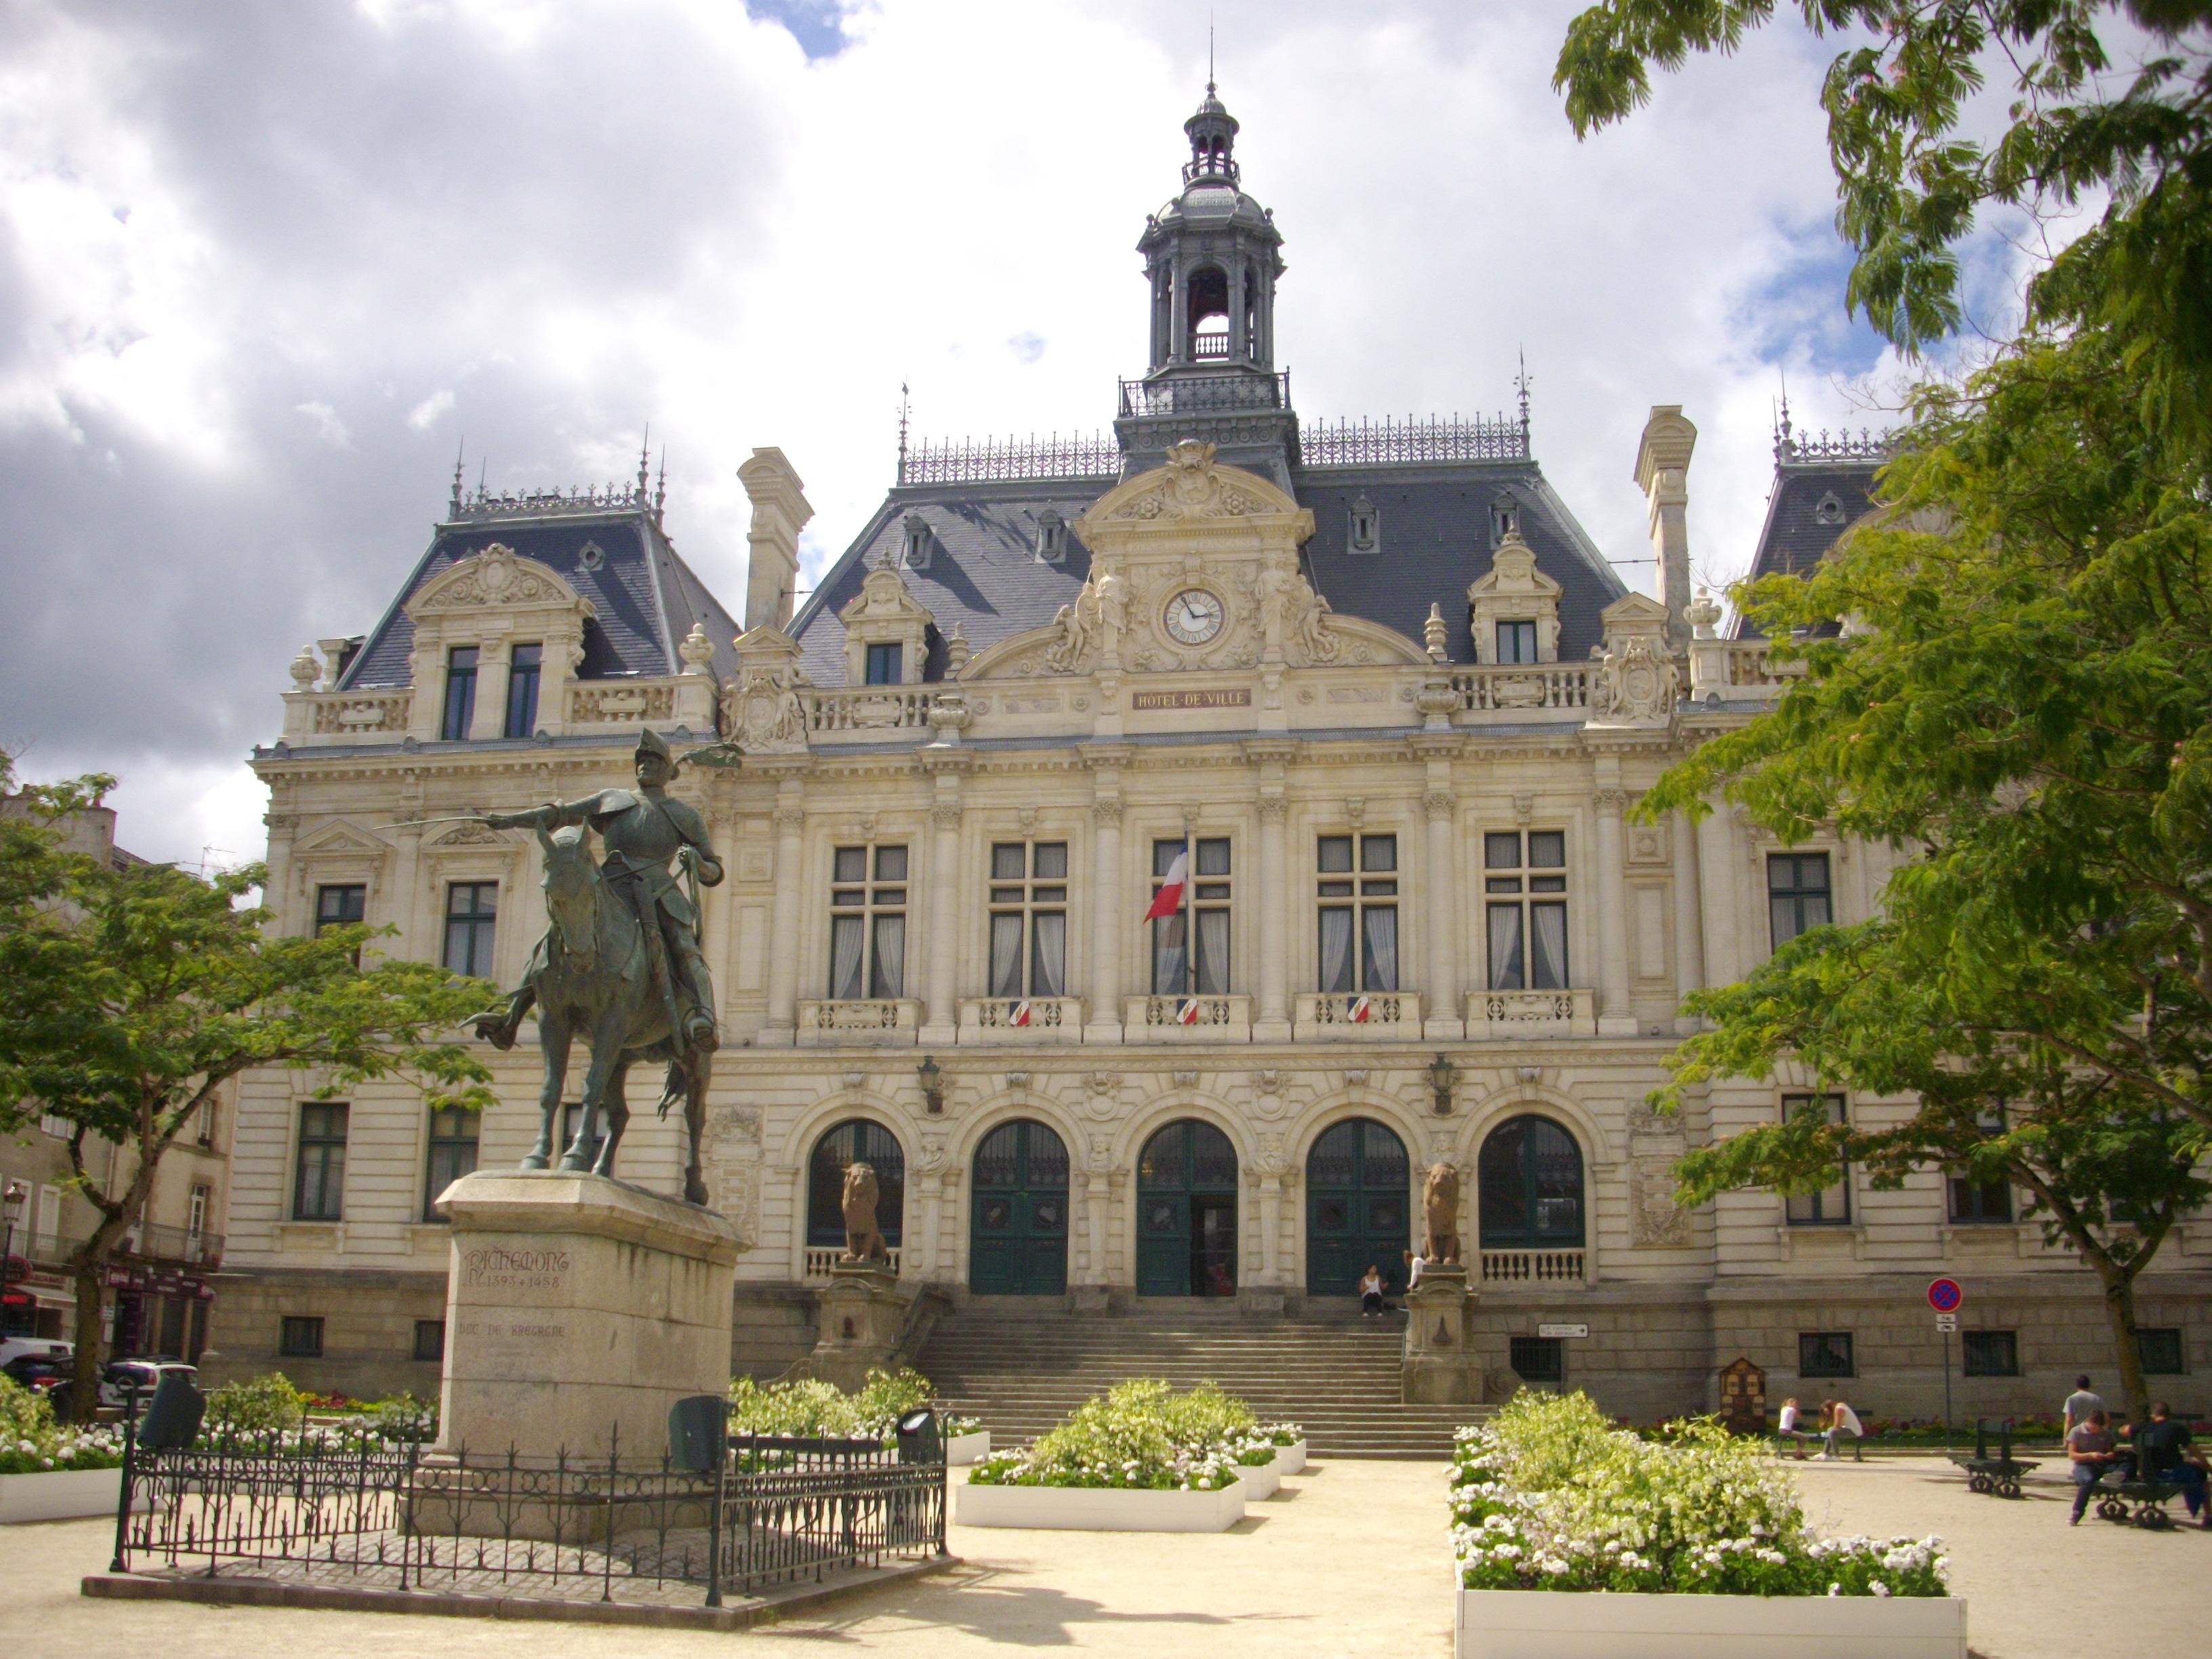 Fichier vannes h tel de ville 03 jpg wikip dia for Hotel avec piscine vannes